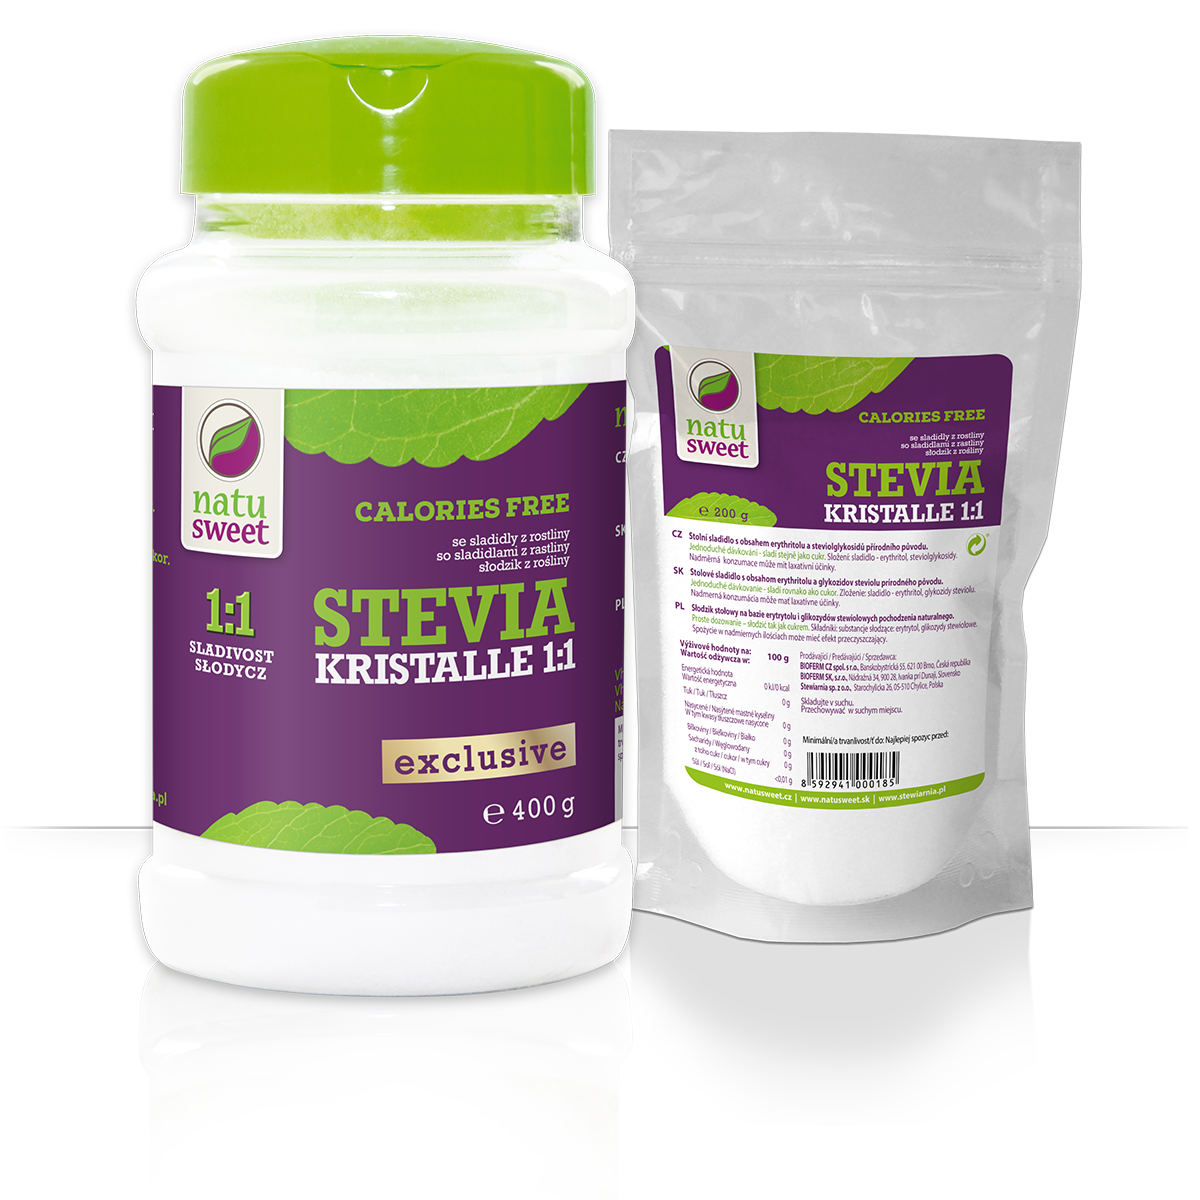 Natusweet Stevia Kristalle